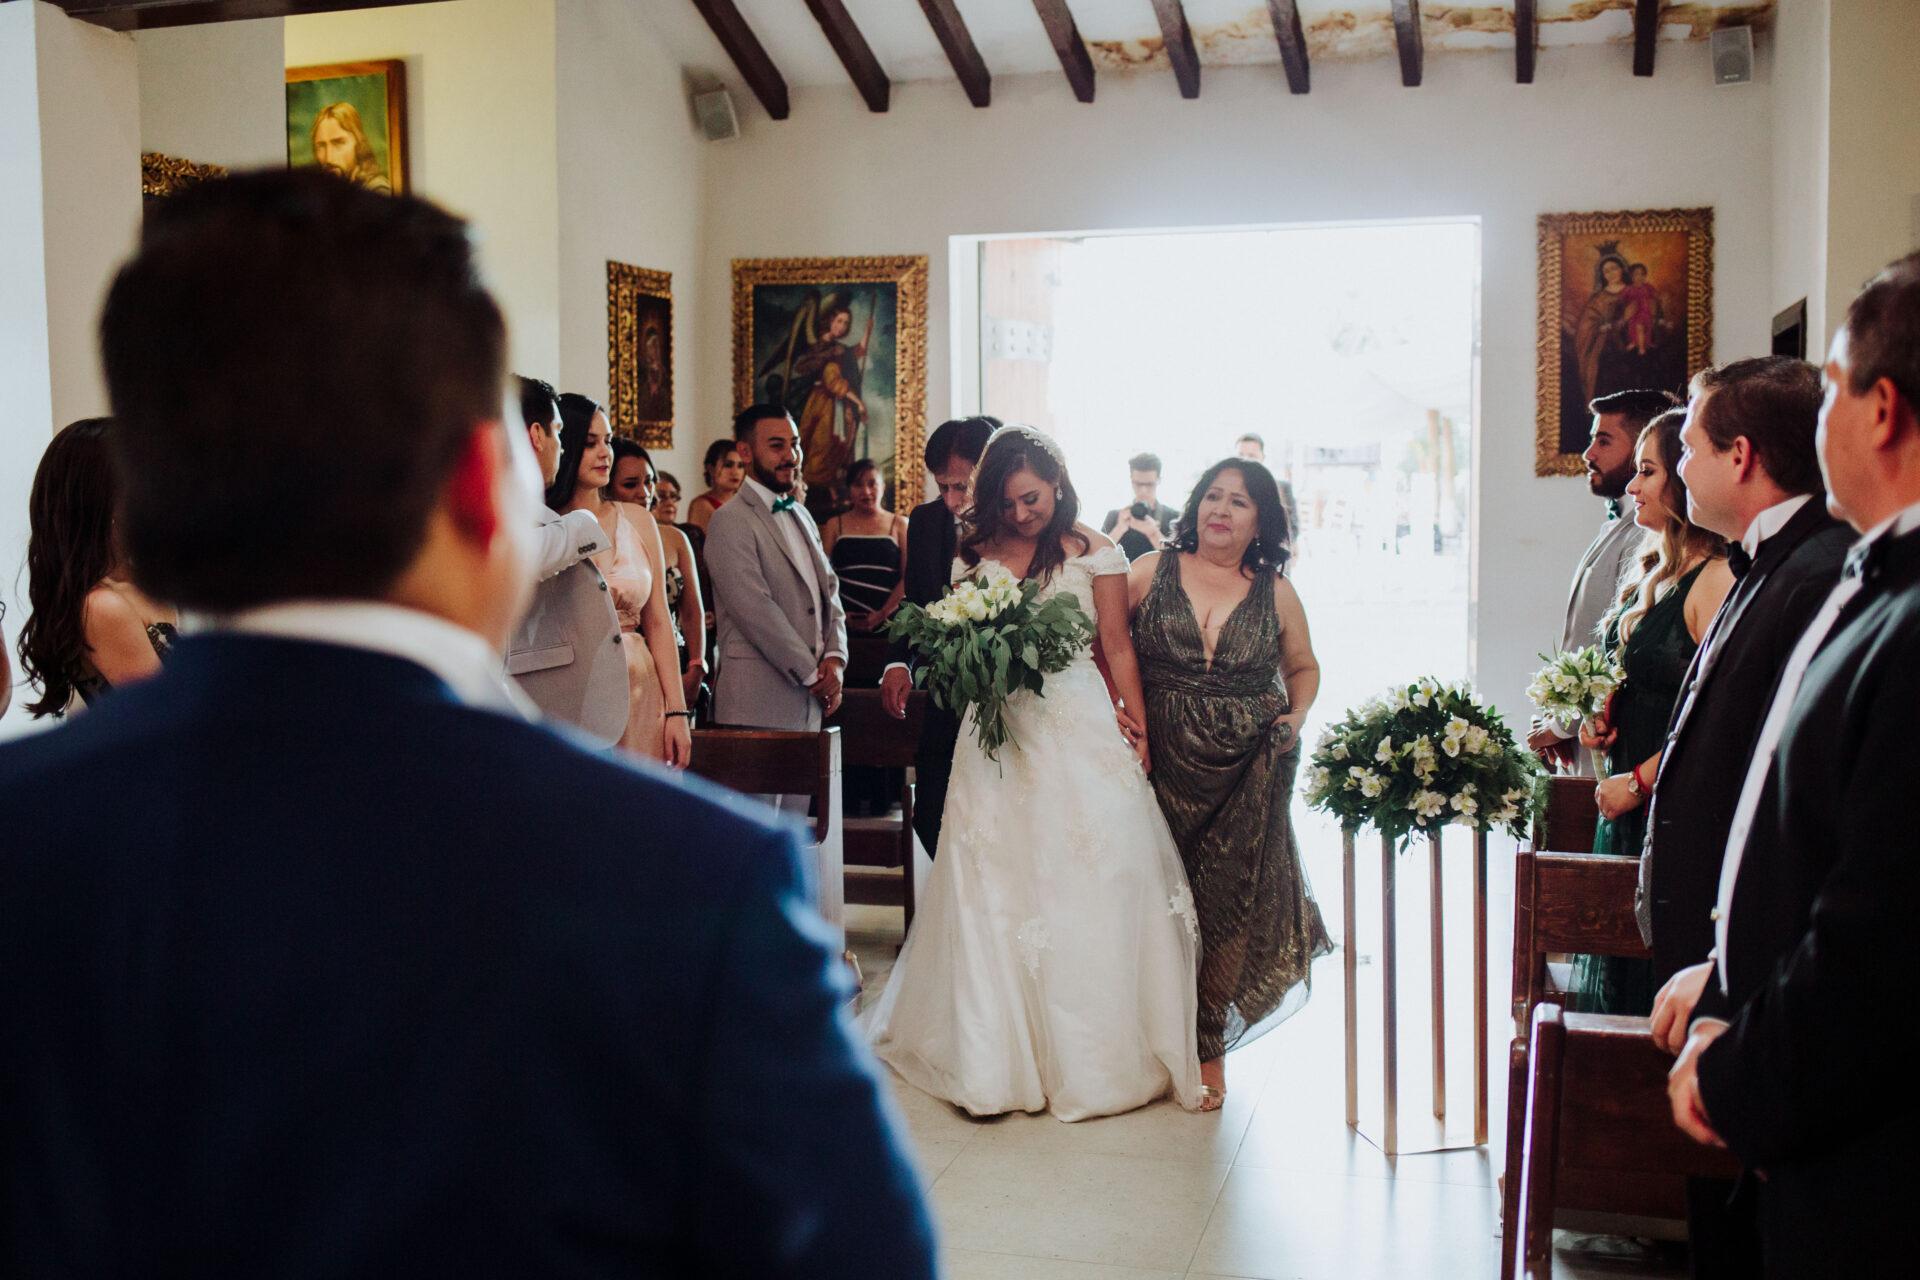 javier_noriega_fotografo_bodas_torreon_coahuila_zacatecas_wedding_photographer27a